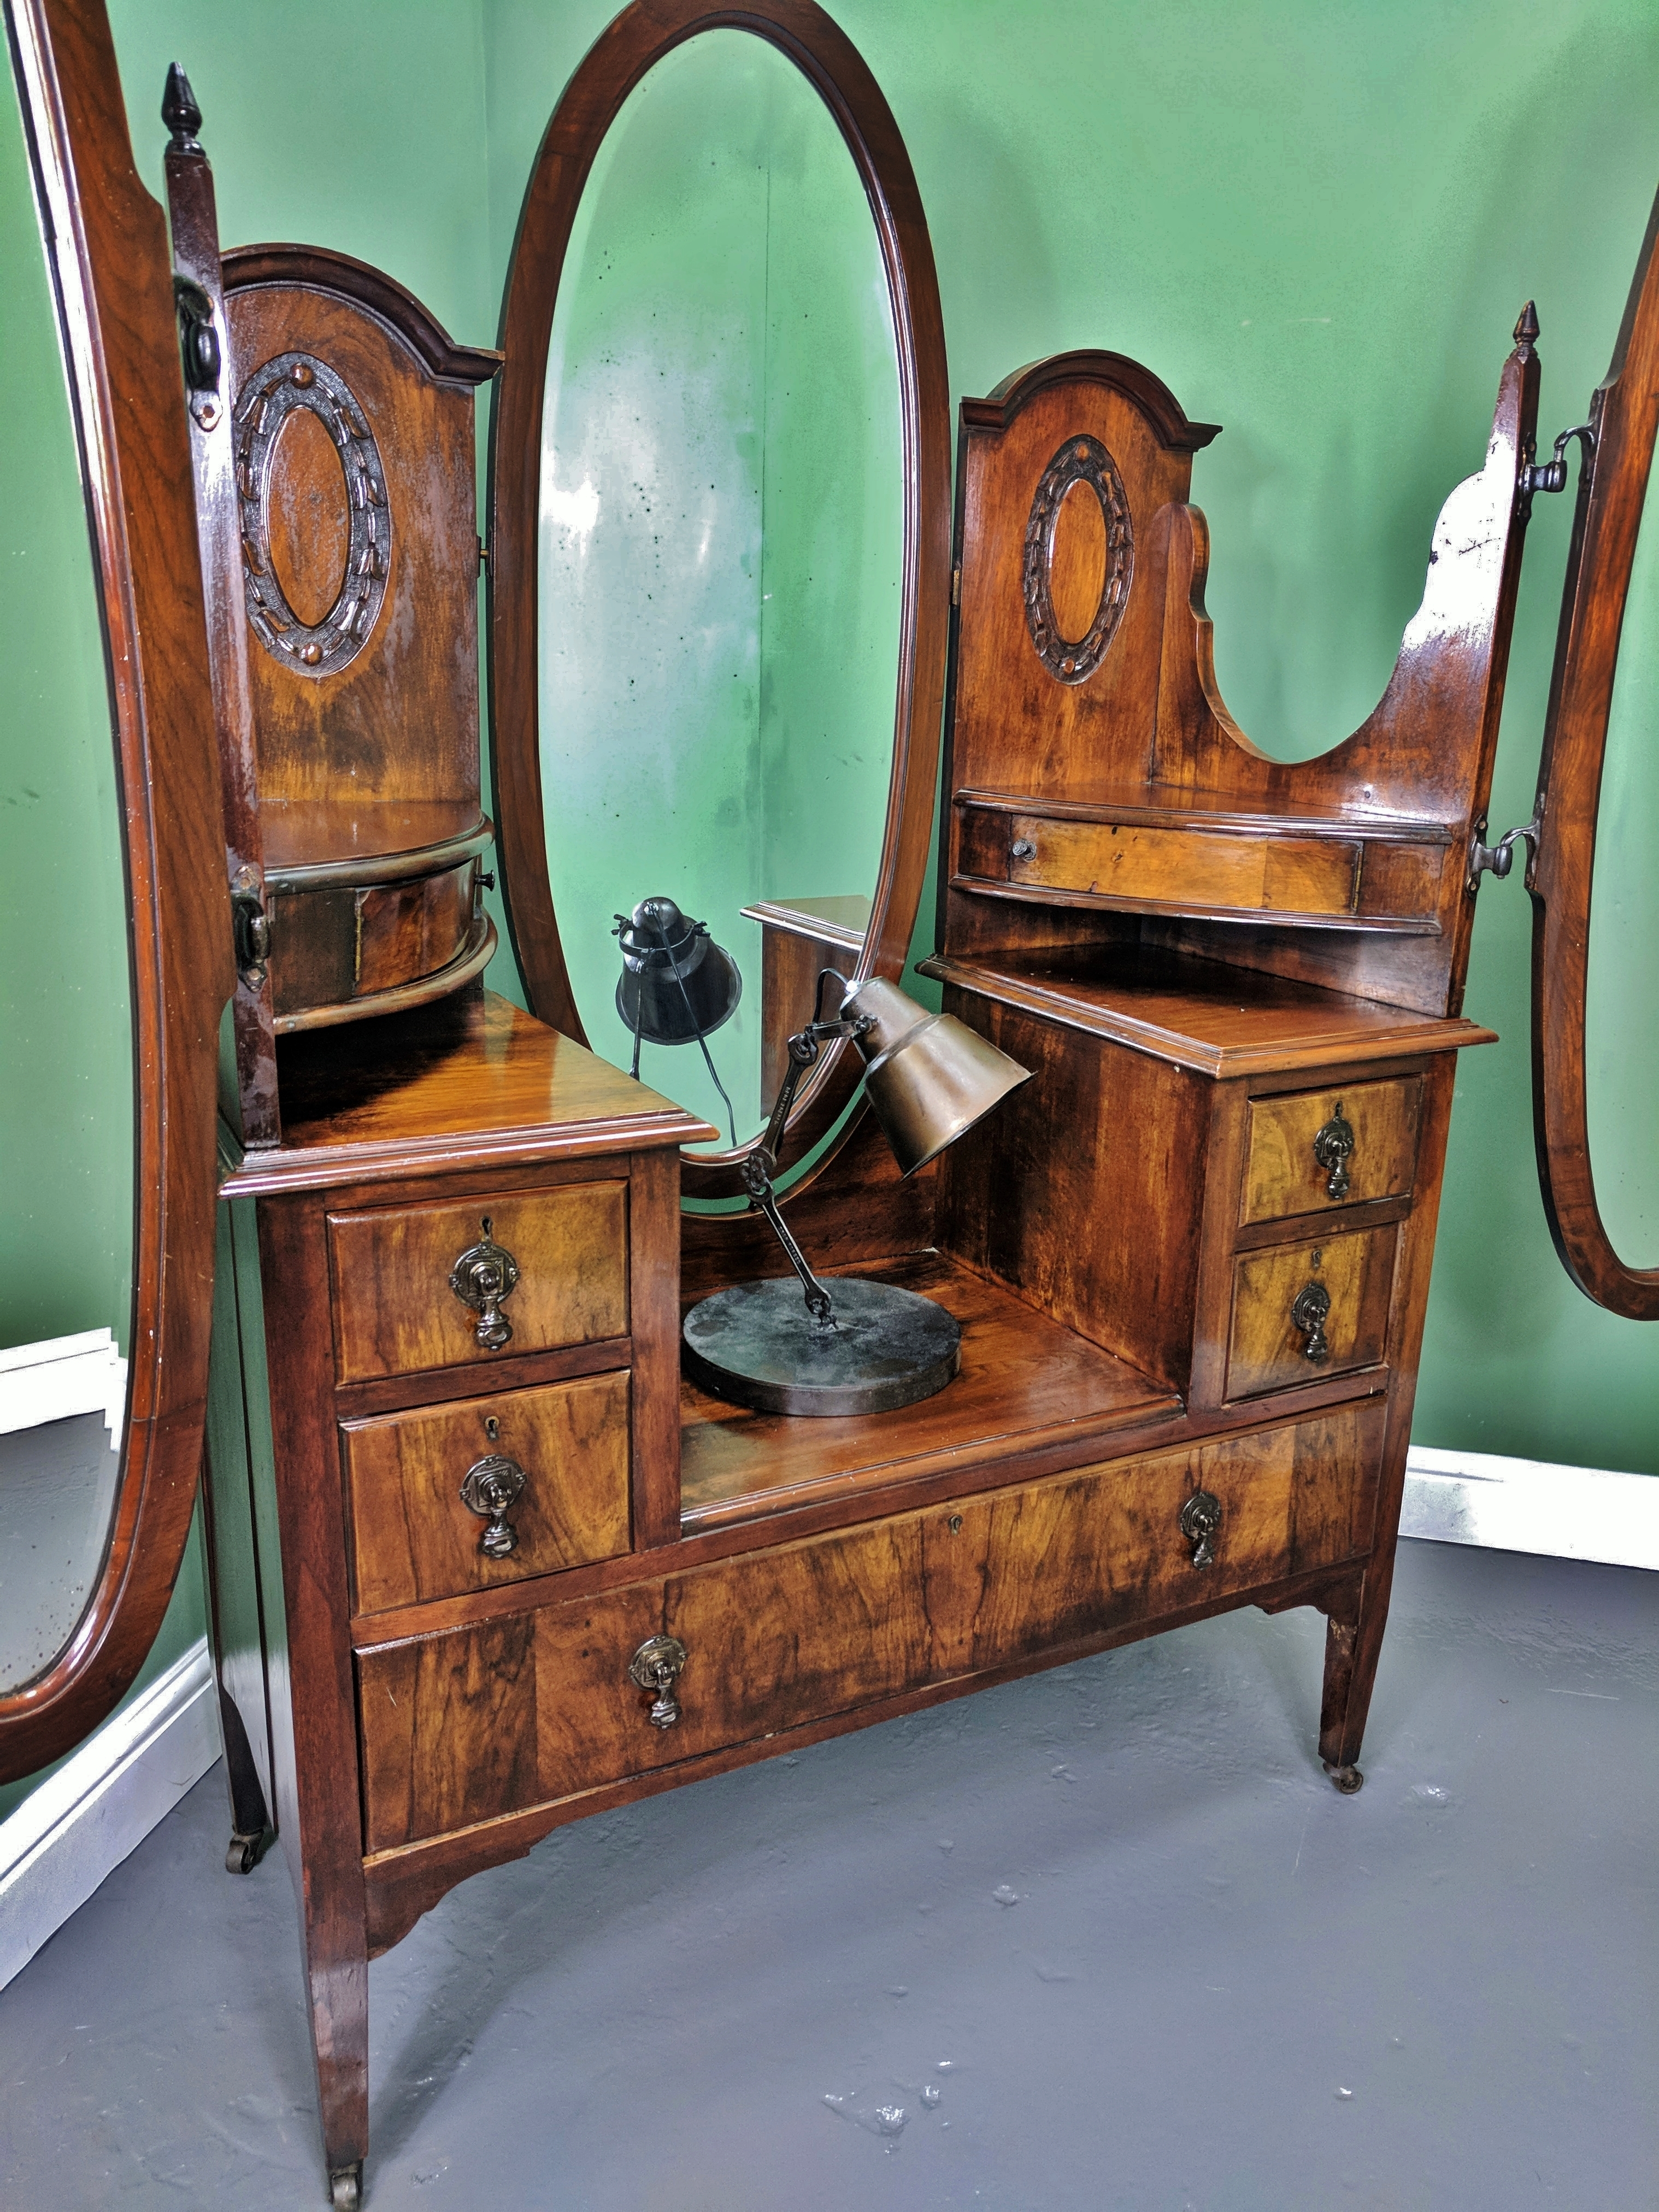 Terrific Unique Antique Furniture West Midlands The Whatnot Shop Download Free Architecture Designs Intelgarnamadebymaigaardcom